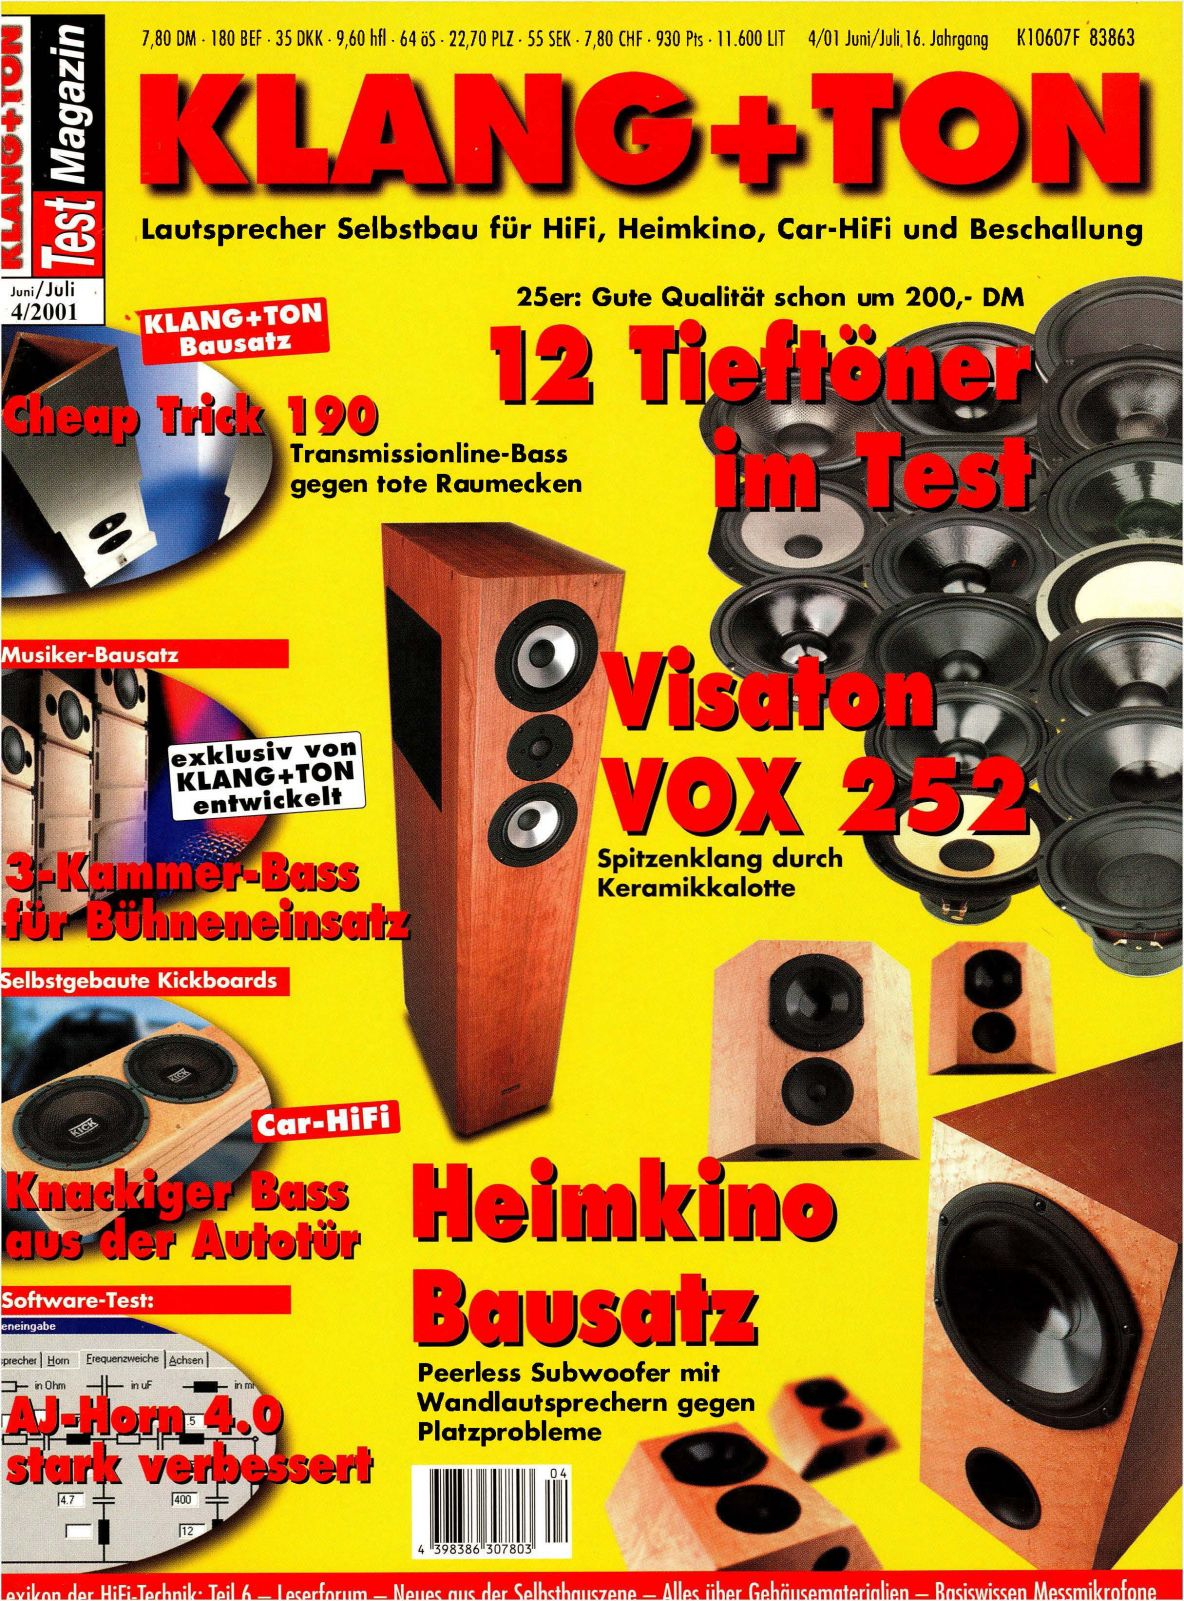 Klang Ton 42001 Epaper